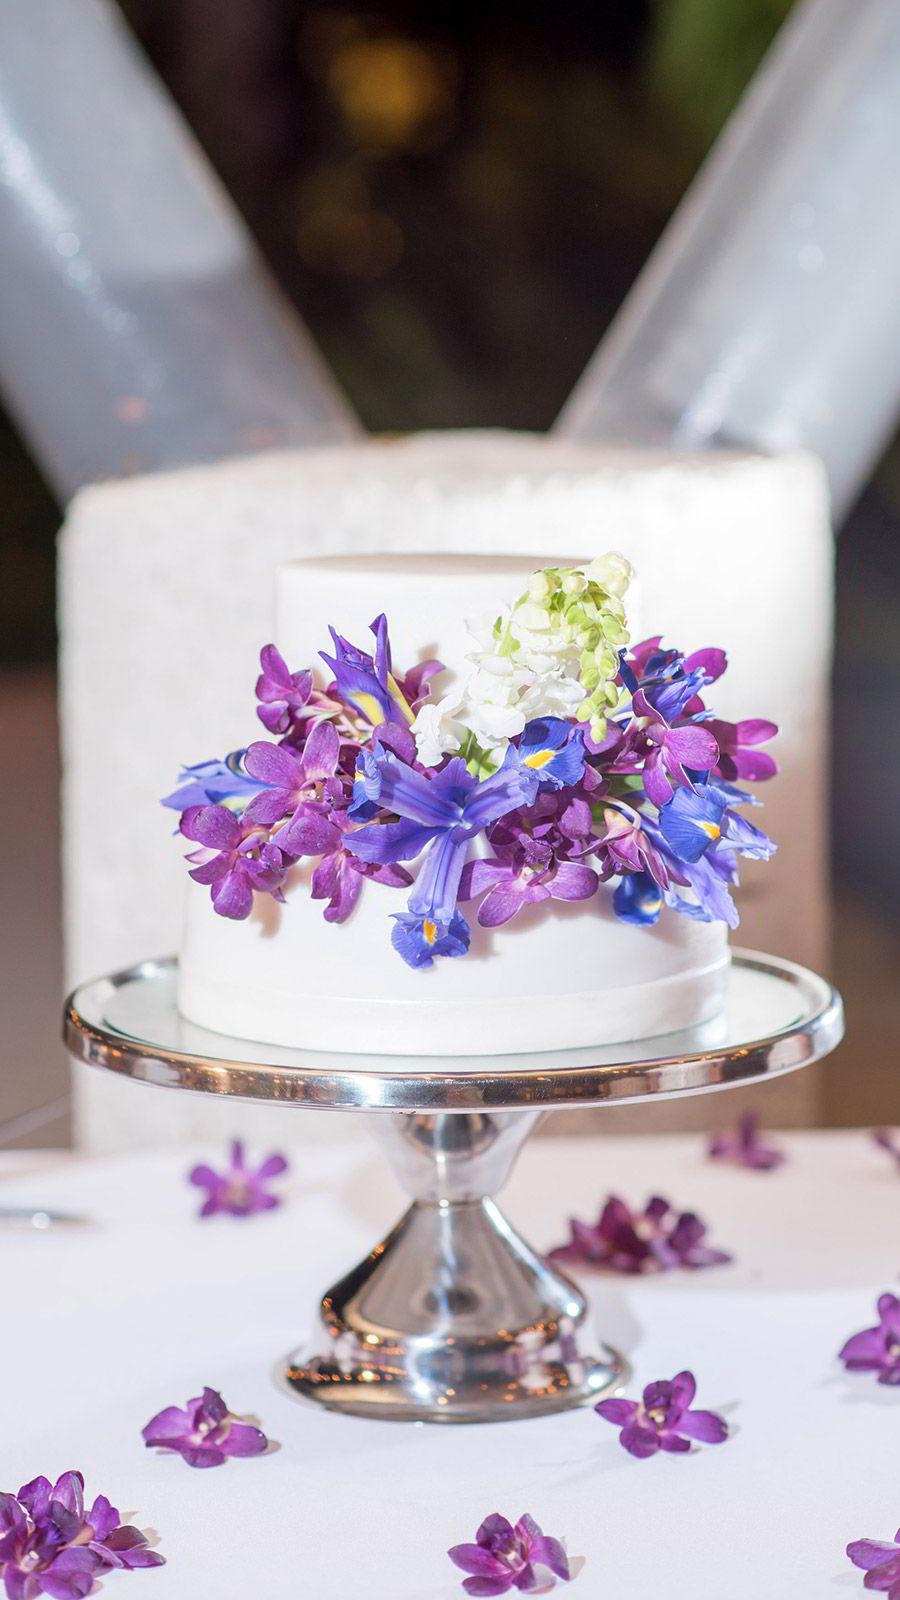 marriott el mangroove guanacaste costa rica honeymoon destination wedding venue wedding cake